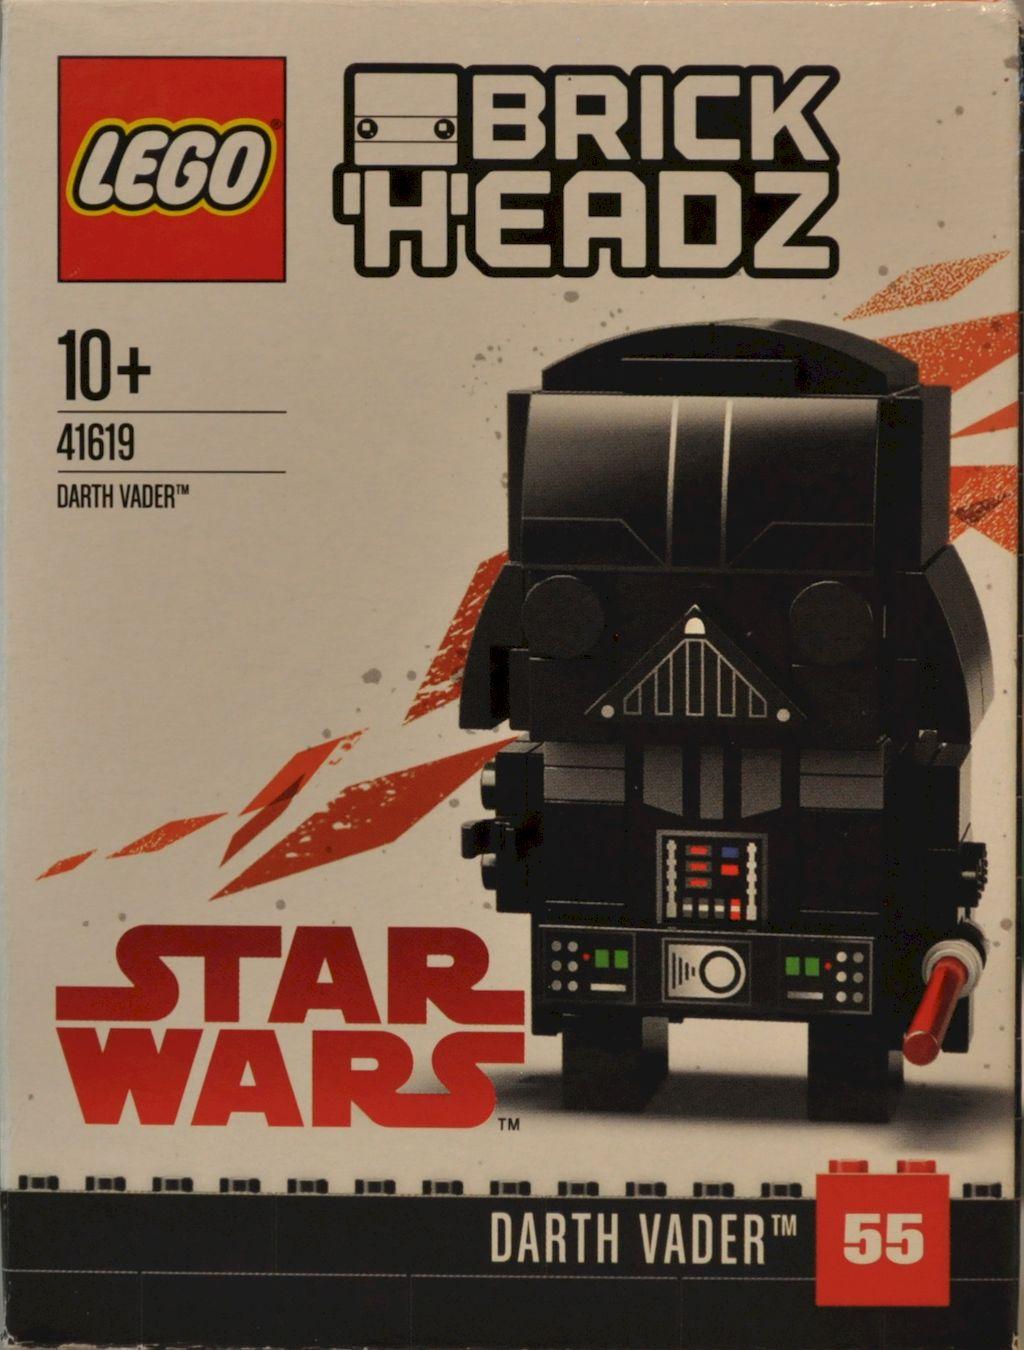 Darth Vader BrickHeadz